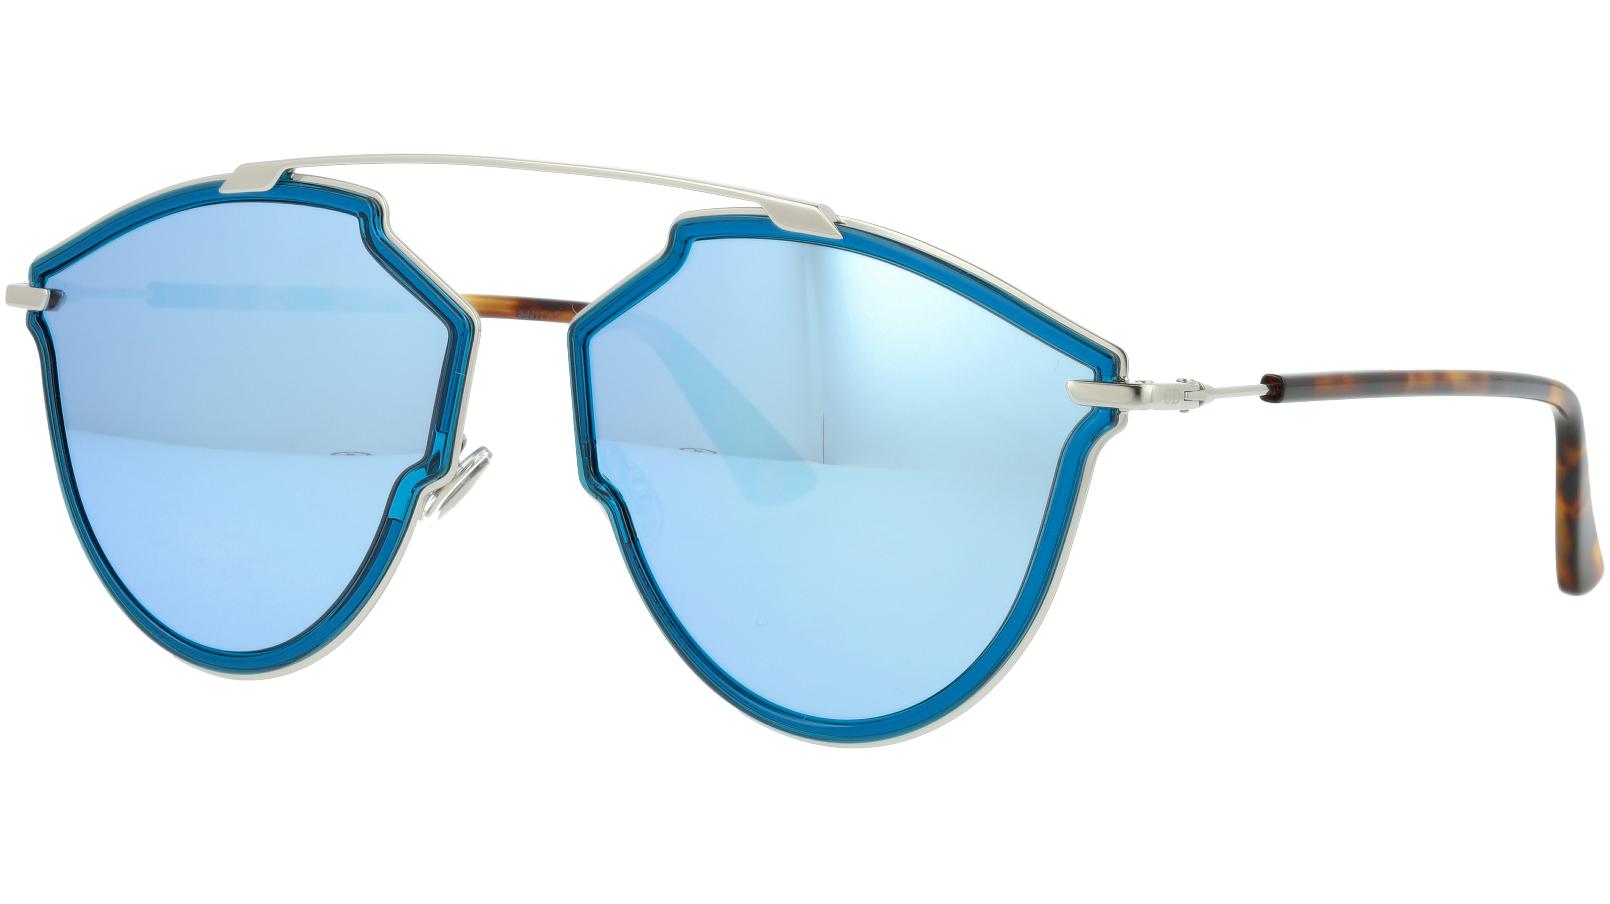 DIOR DIORSOREALRISE 8IGA4 58 GREEN Sunglasses